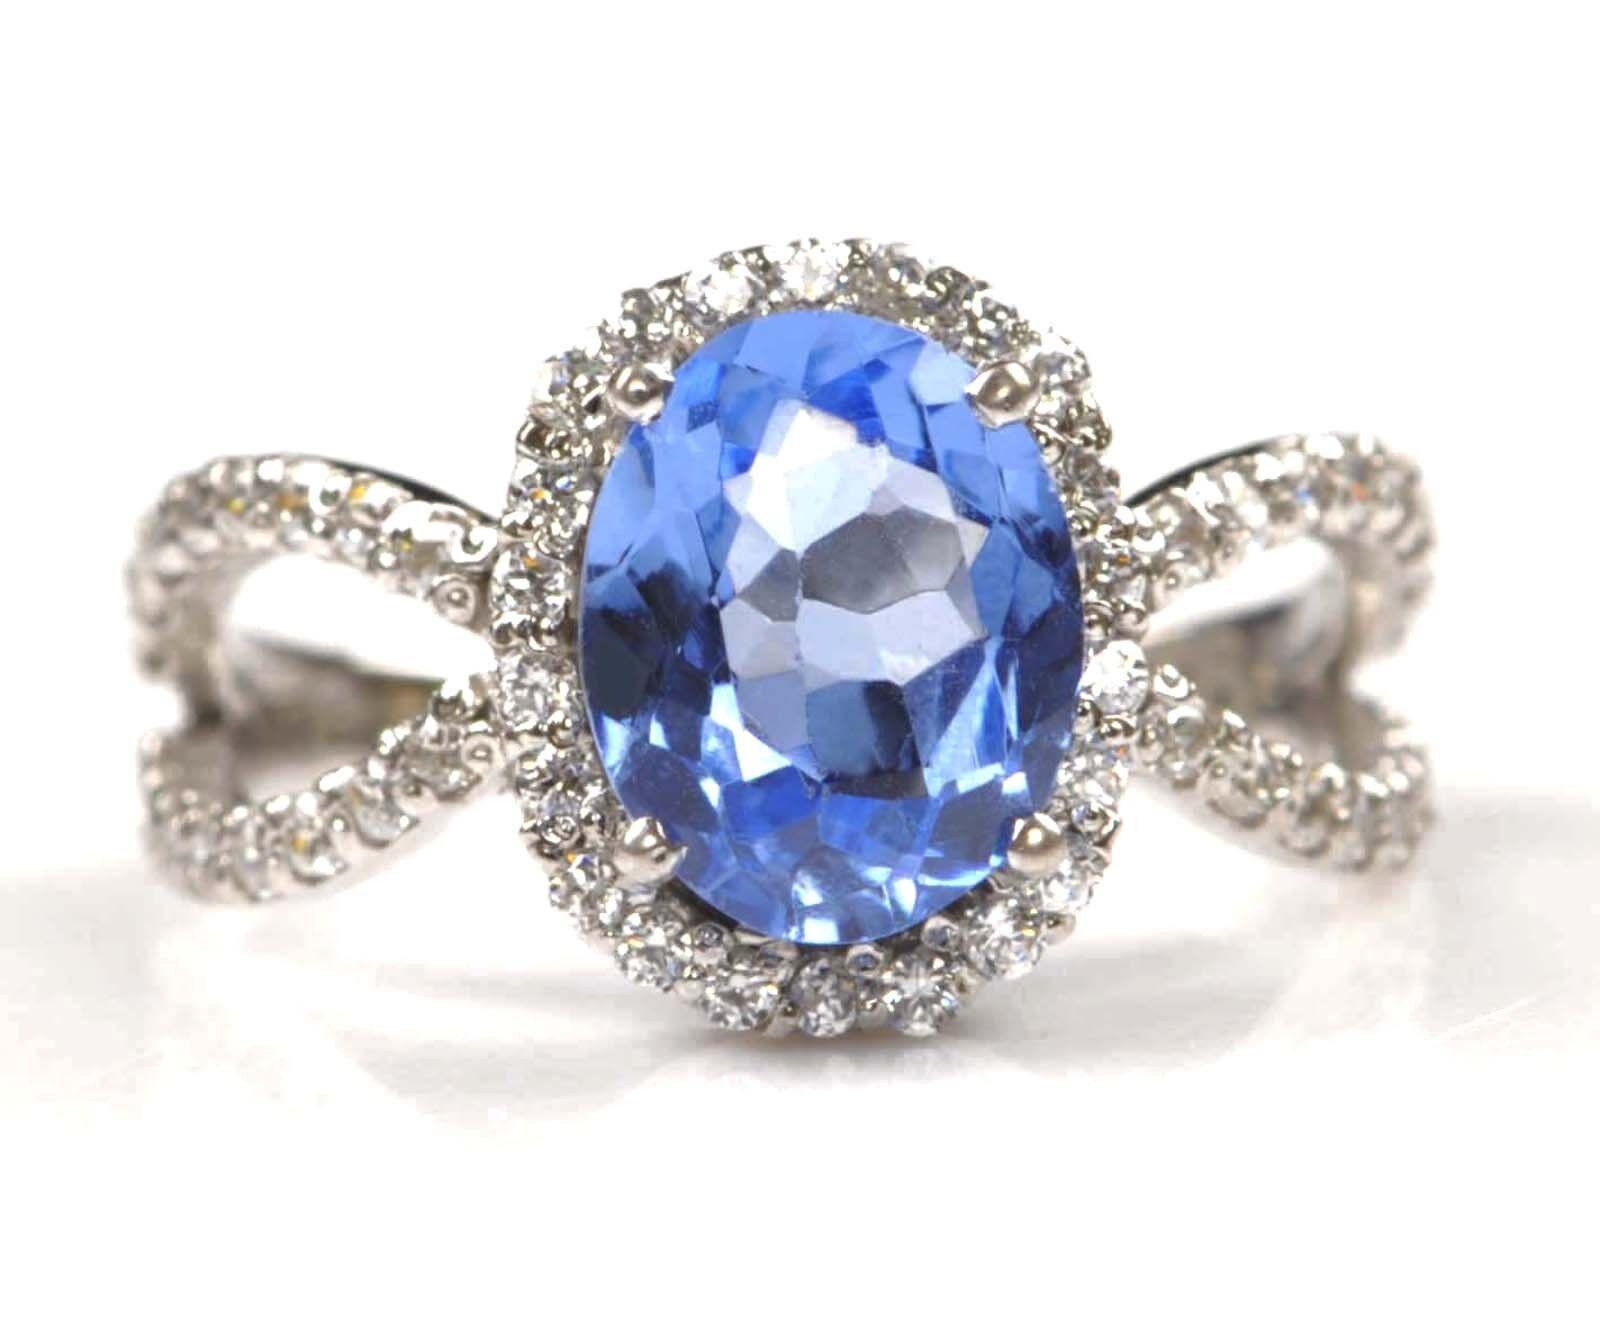 2.50 Carat 14KT Solid White gold Natural bluee Topaz IGI Certified Diamond Ring